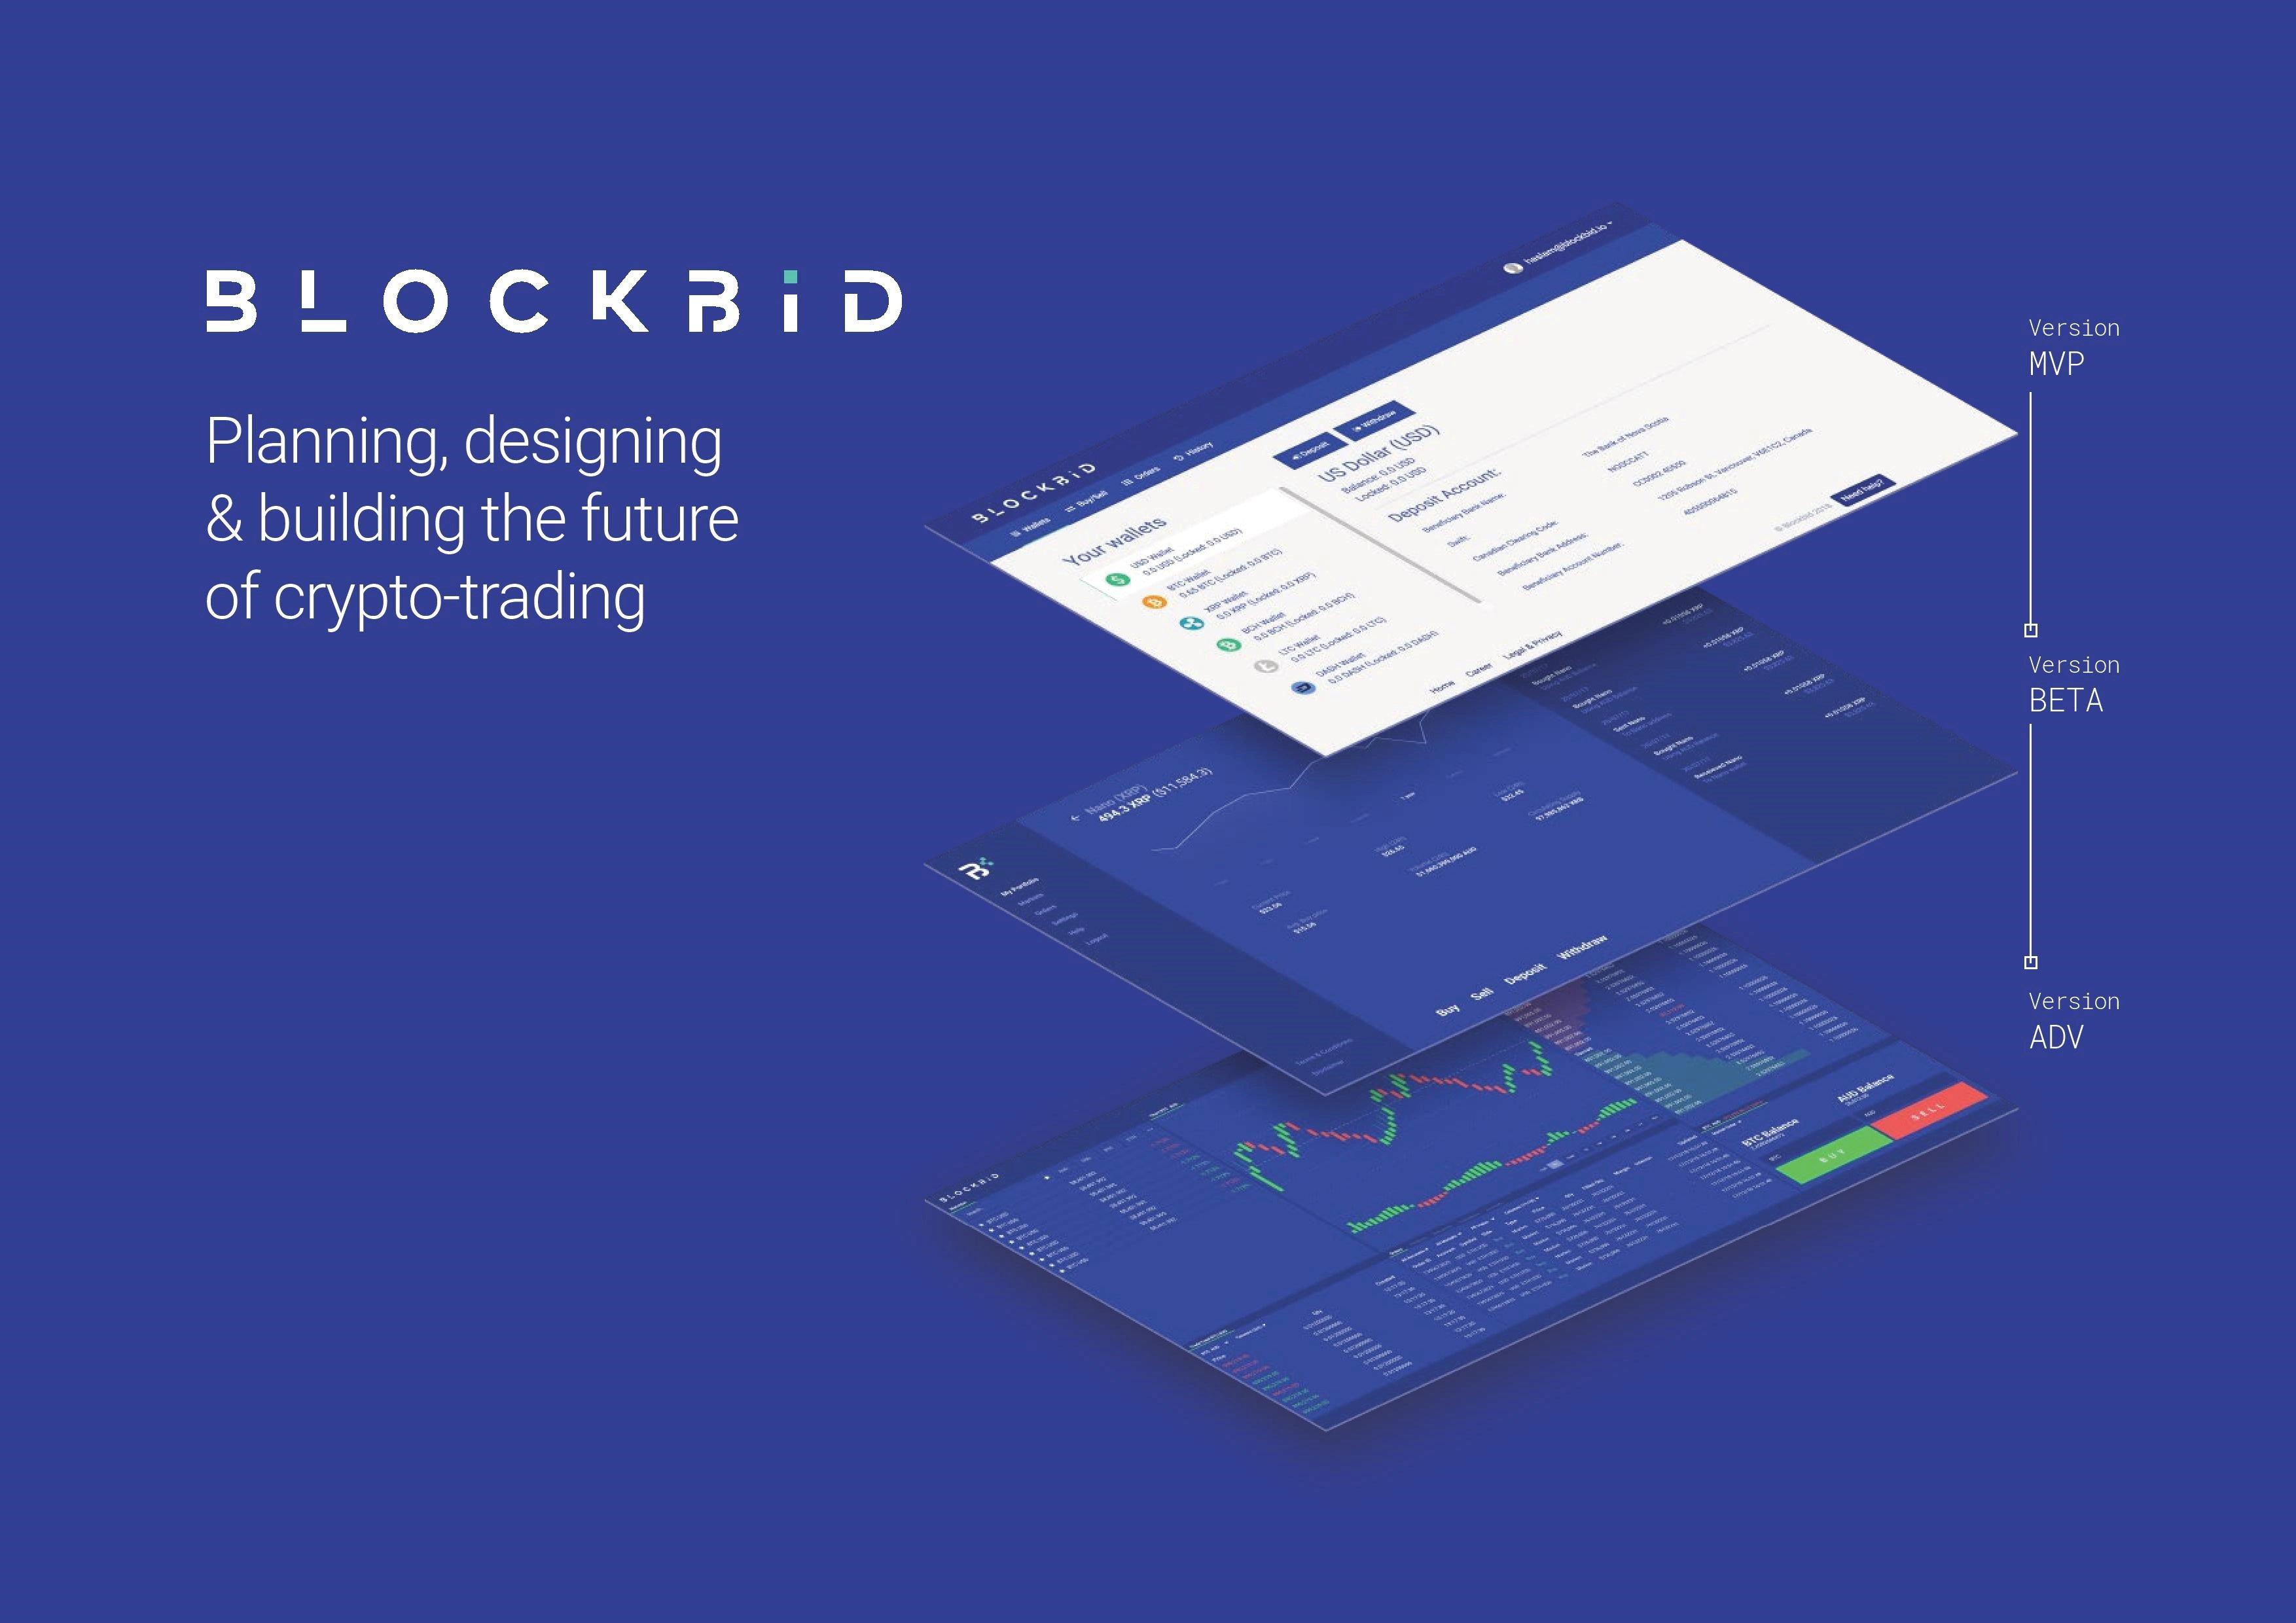 AUSTRAC approves license for Blockbid, Australia's first insured exchange